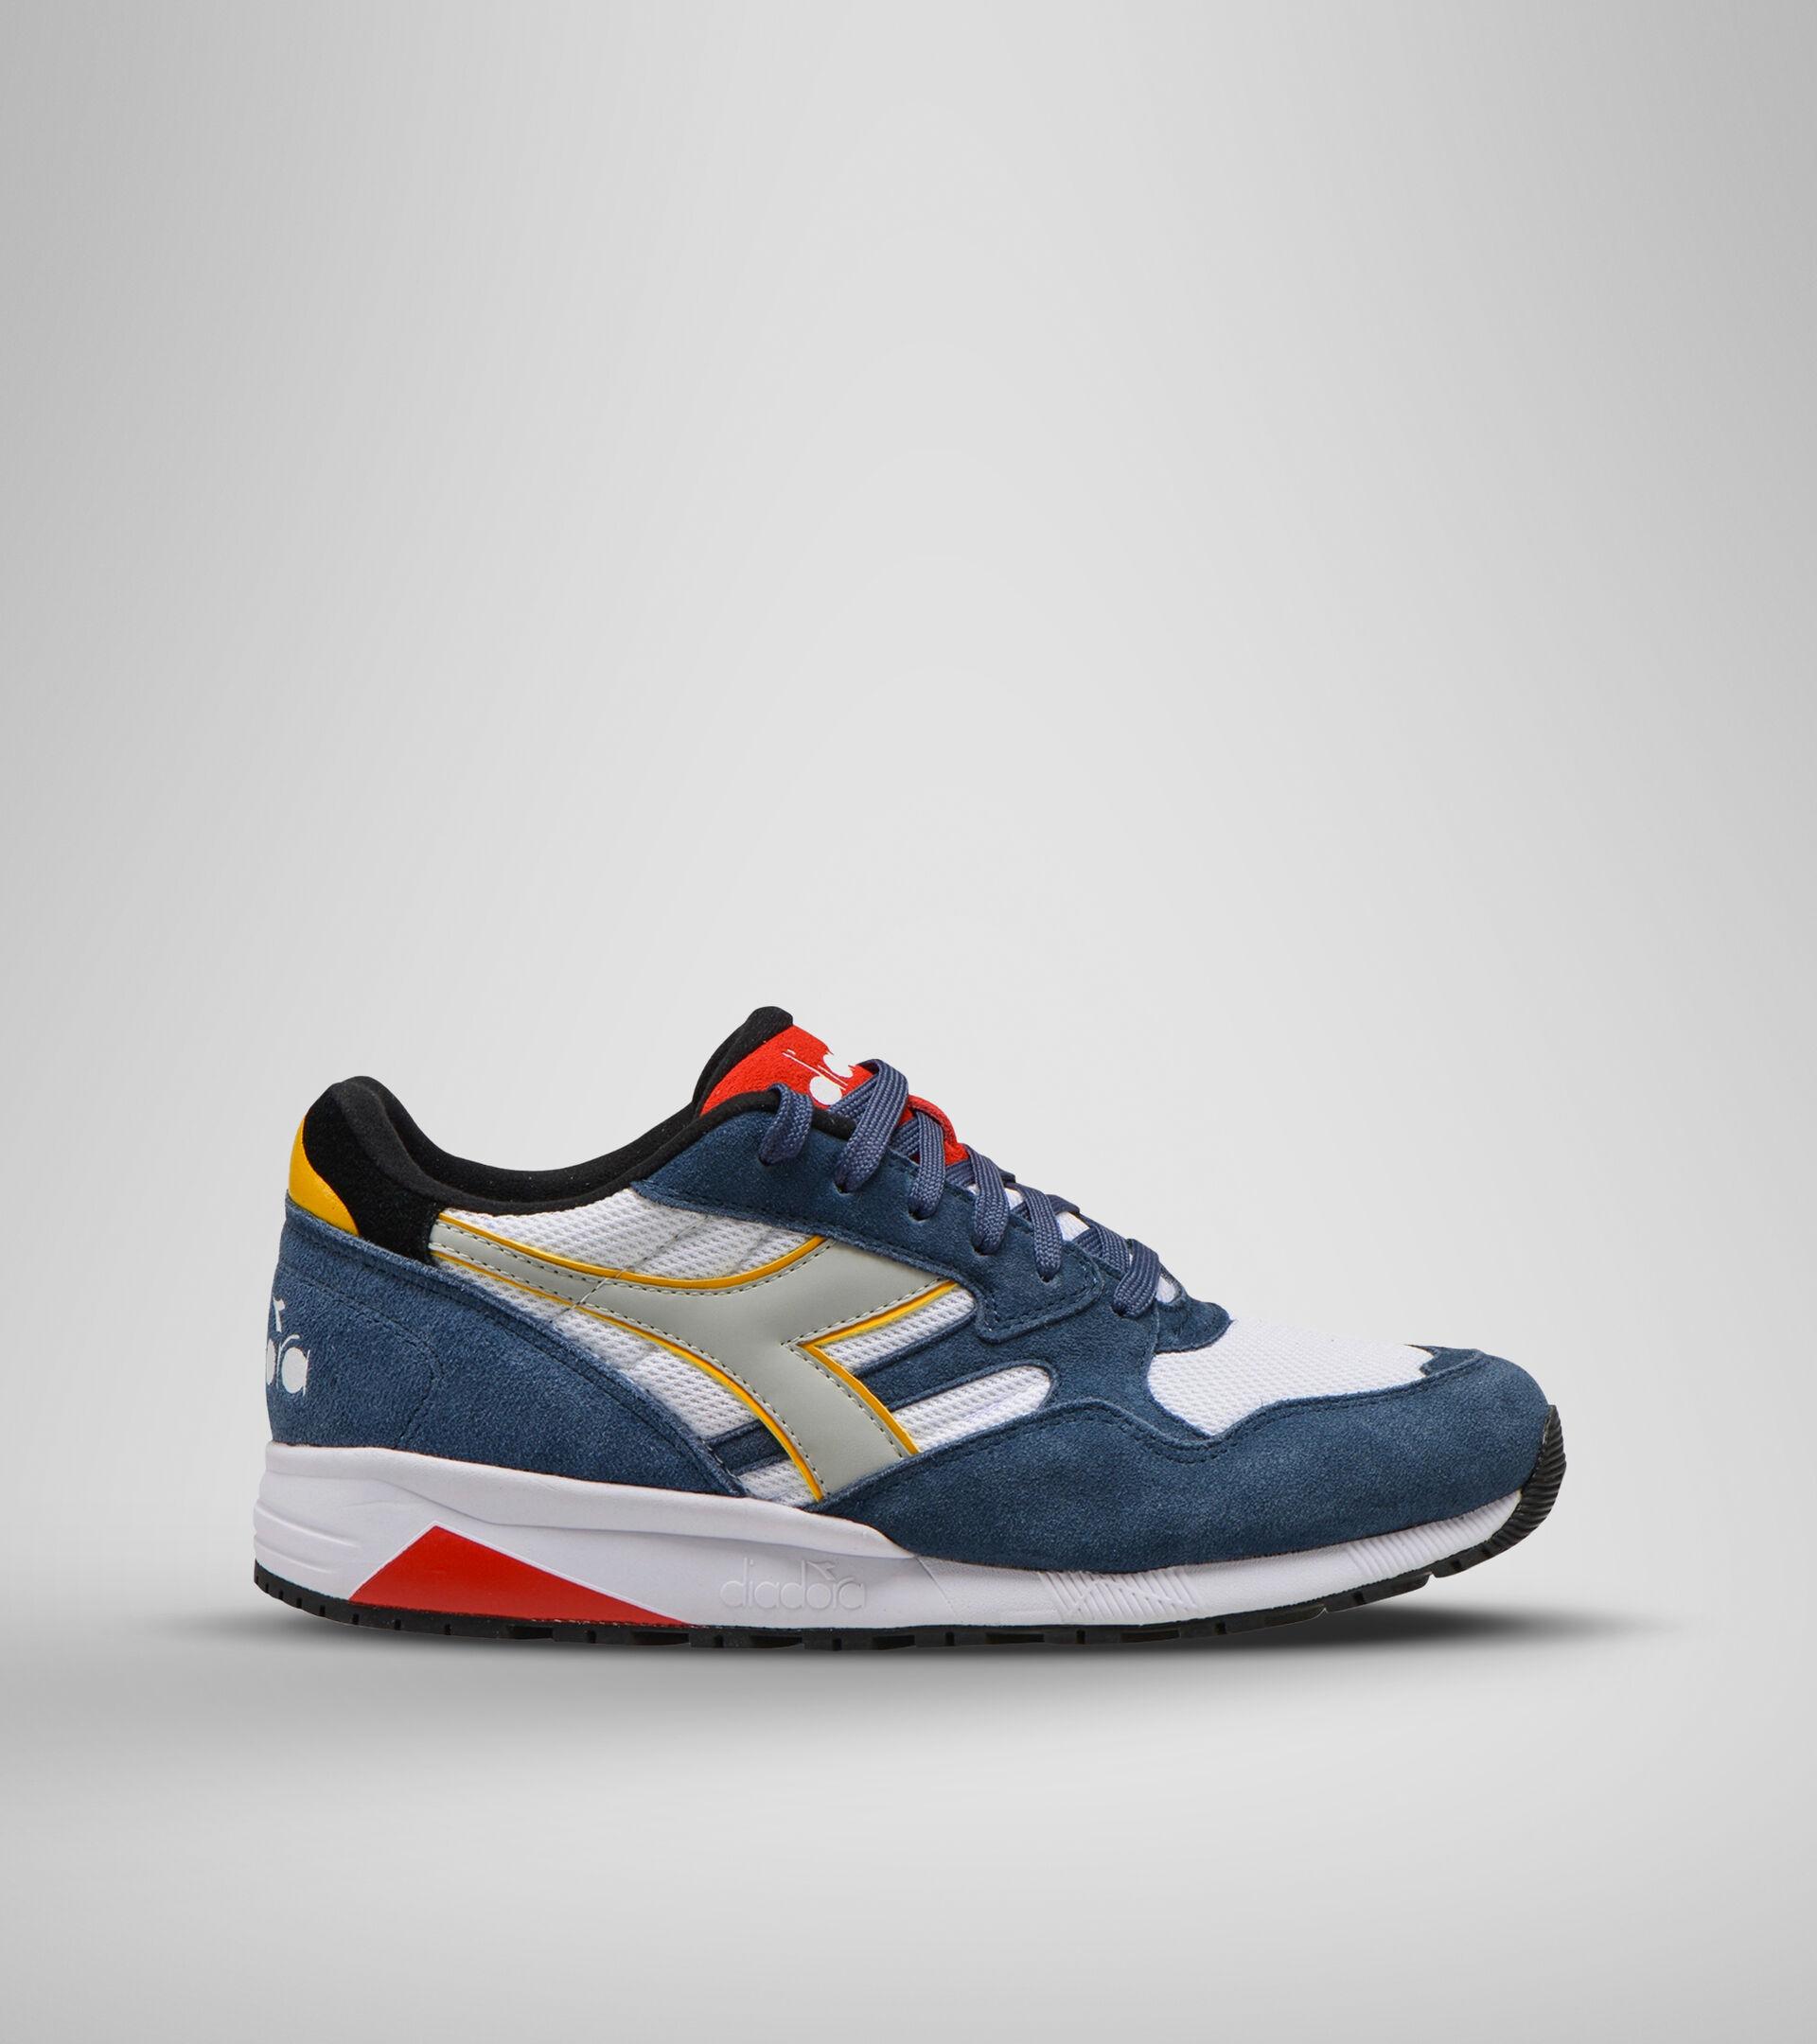 Footwear Sportswear UNISEX N902 S DARK DENIM/WHITE/FIERY RED Diadora